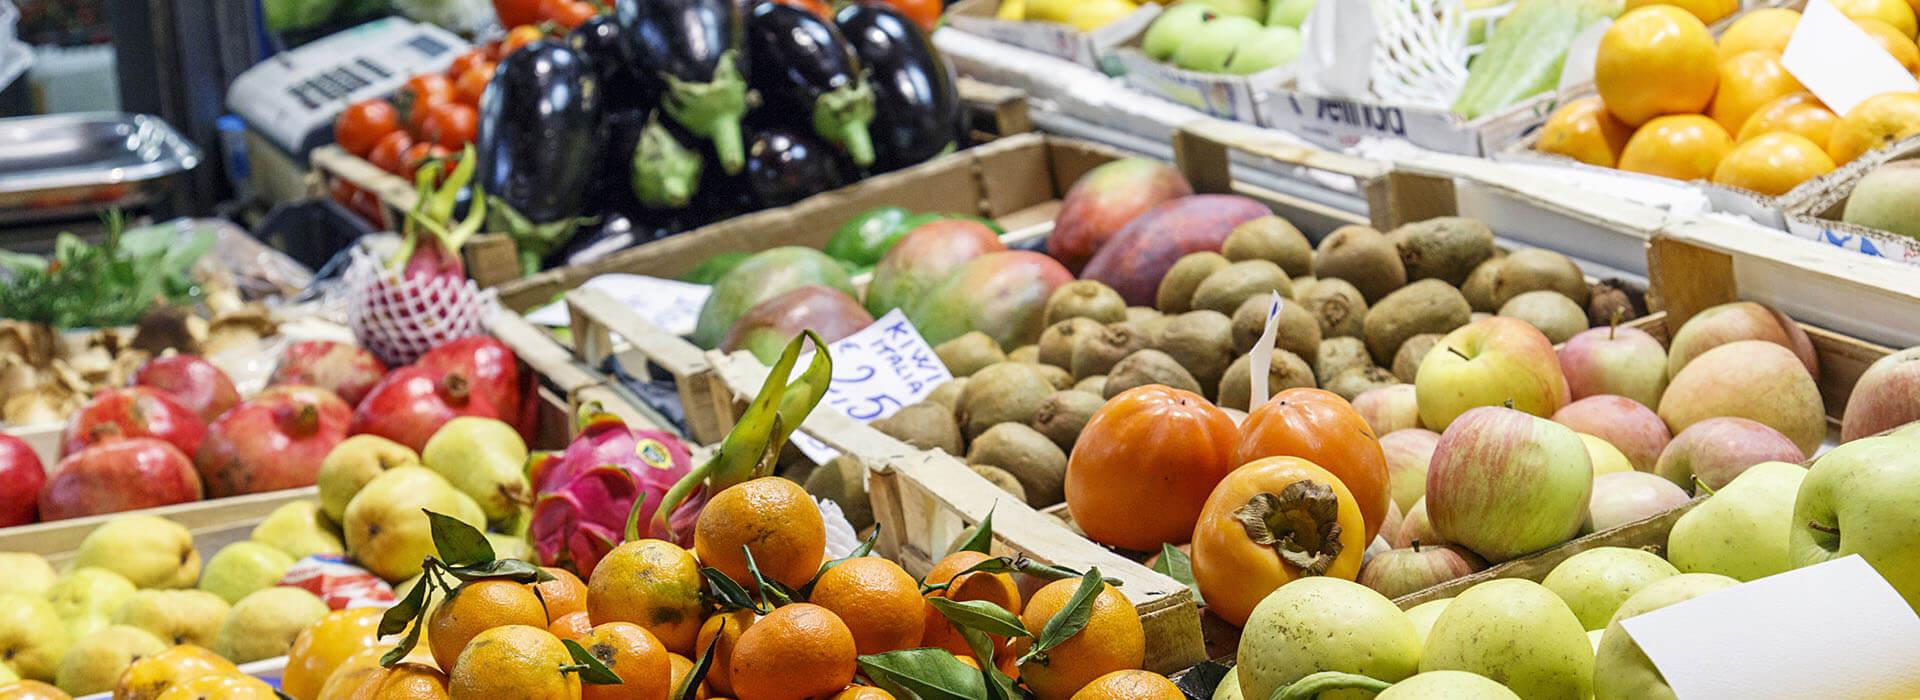 legumes-lepetitmarchedesteve-oupeye